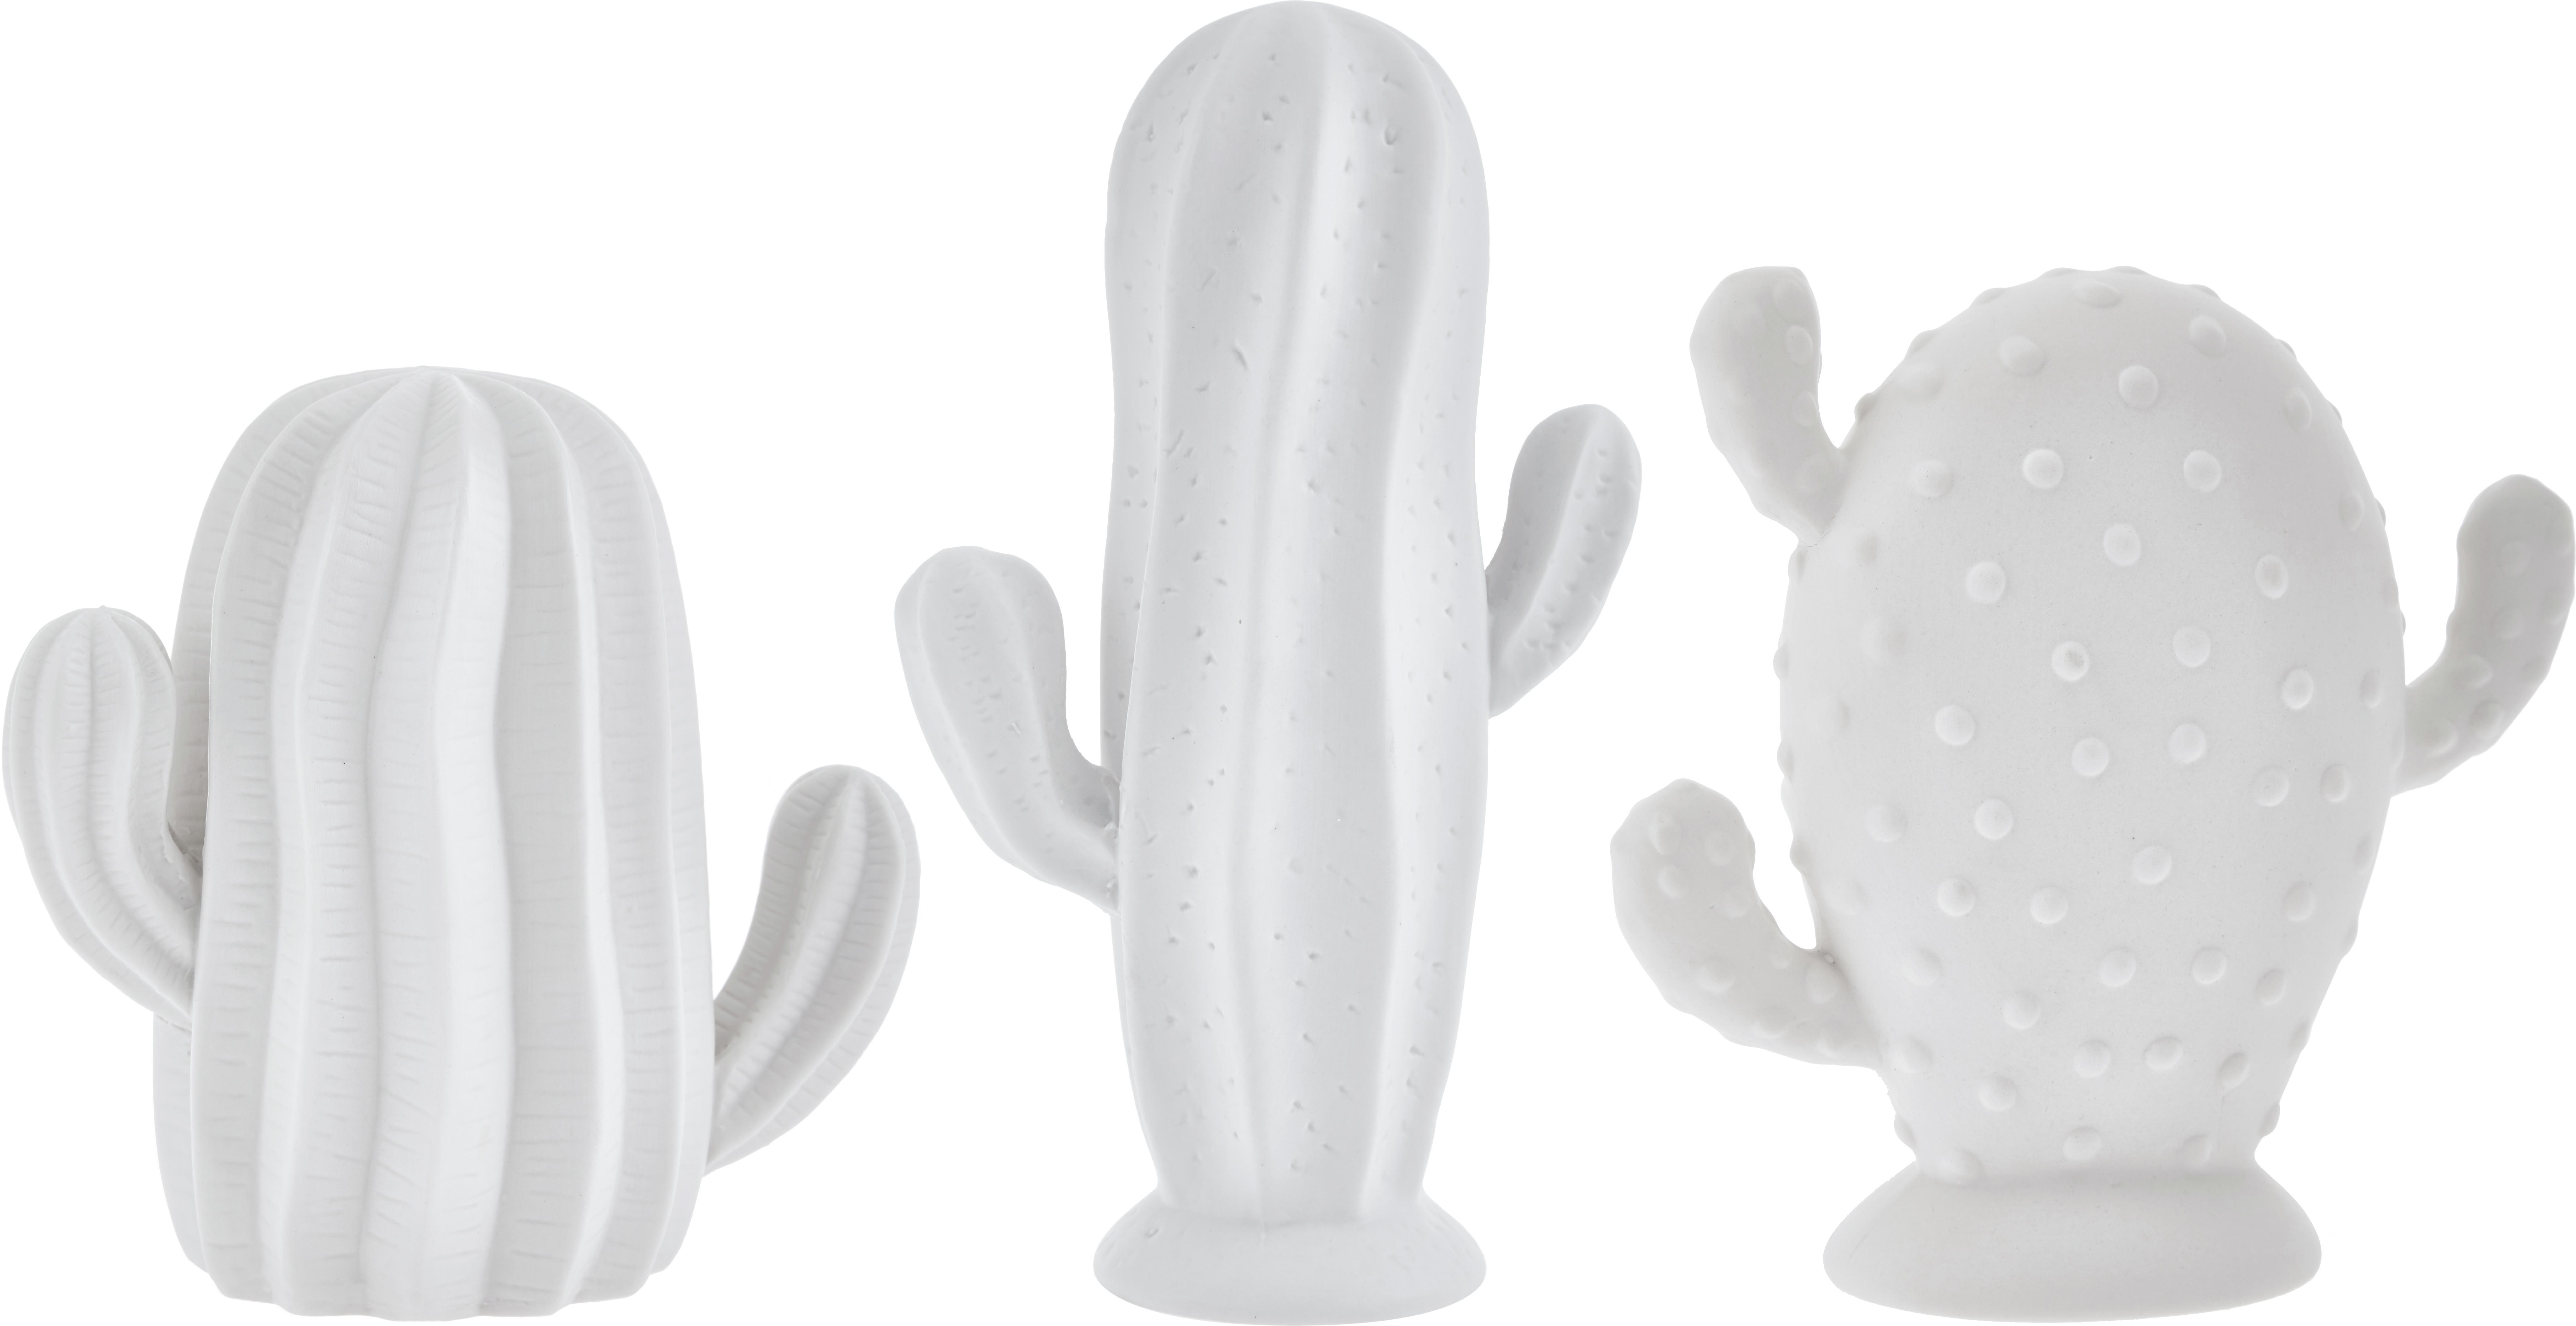 Set 3 cactus da decorazione Dina, Porcellana non trattata opaca, Bianco, Set in varie misure